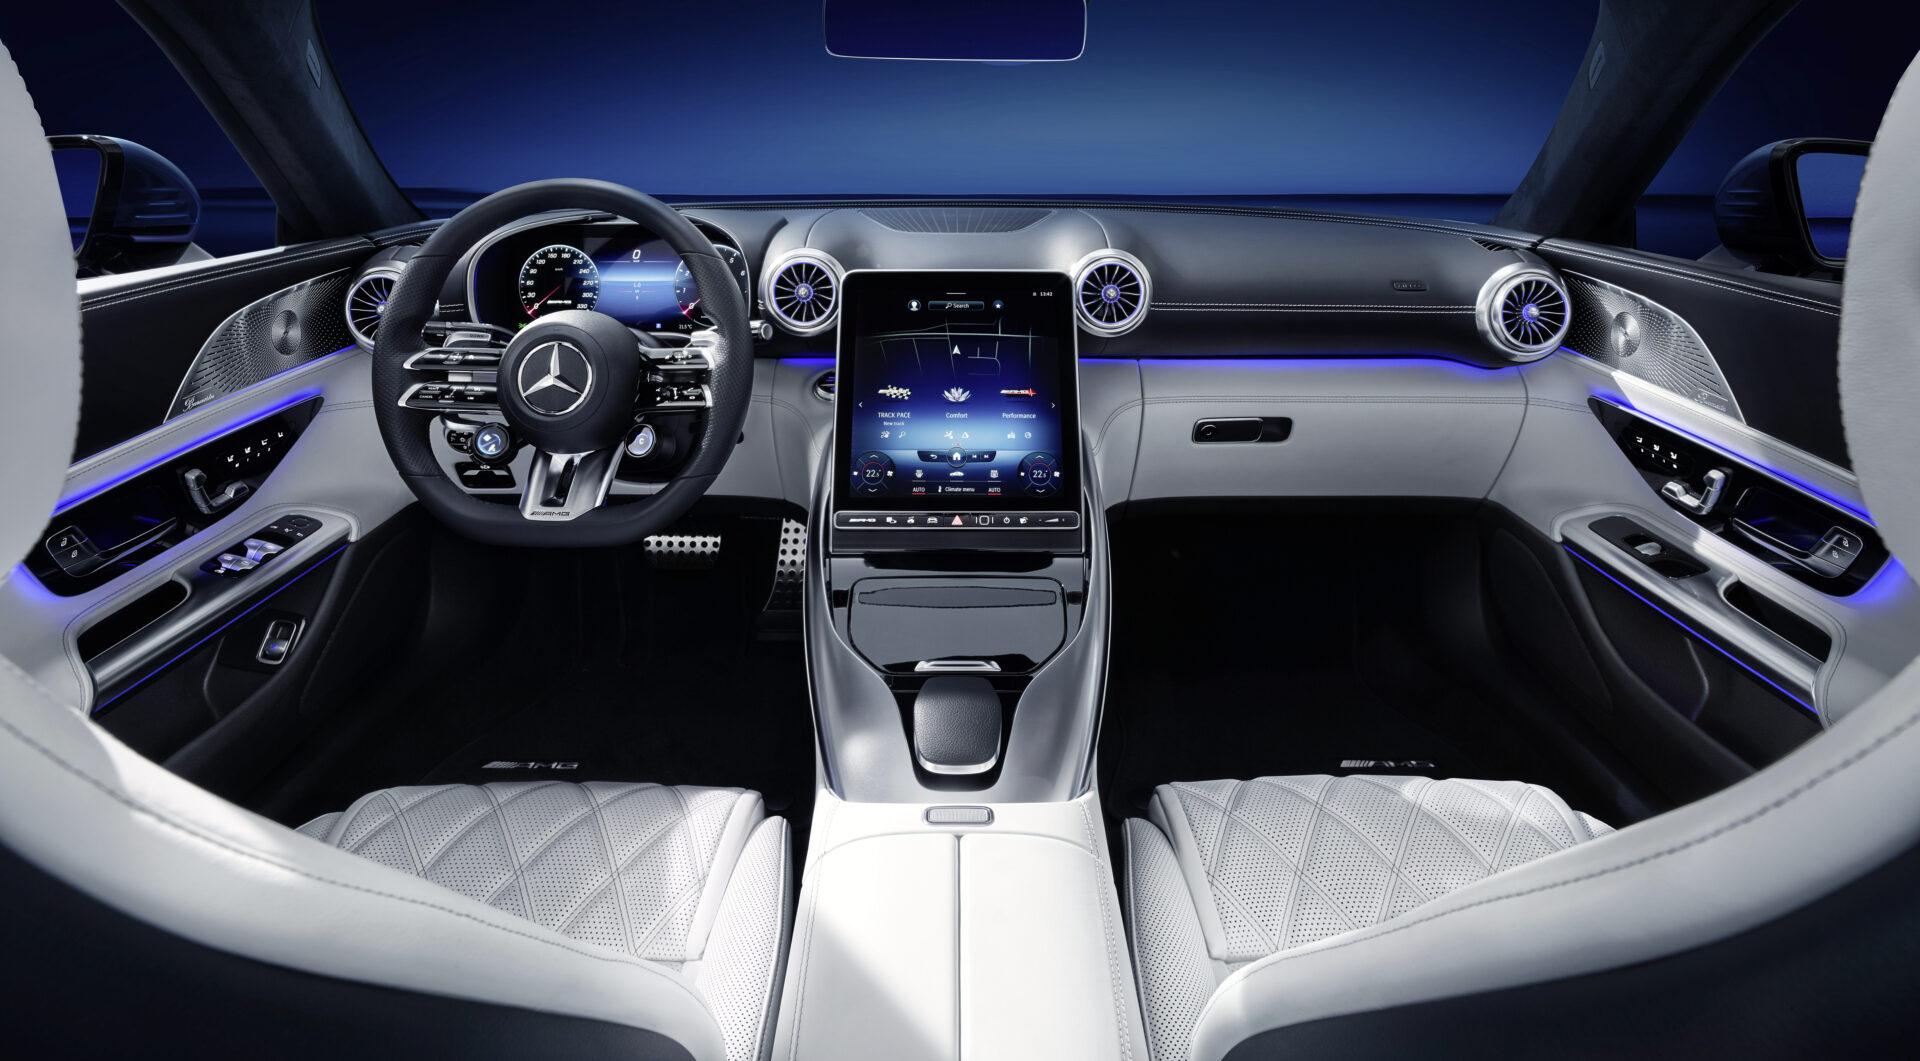 Mercedes-AMG SL interior